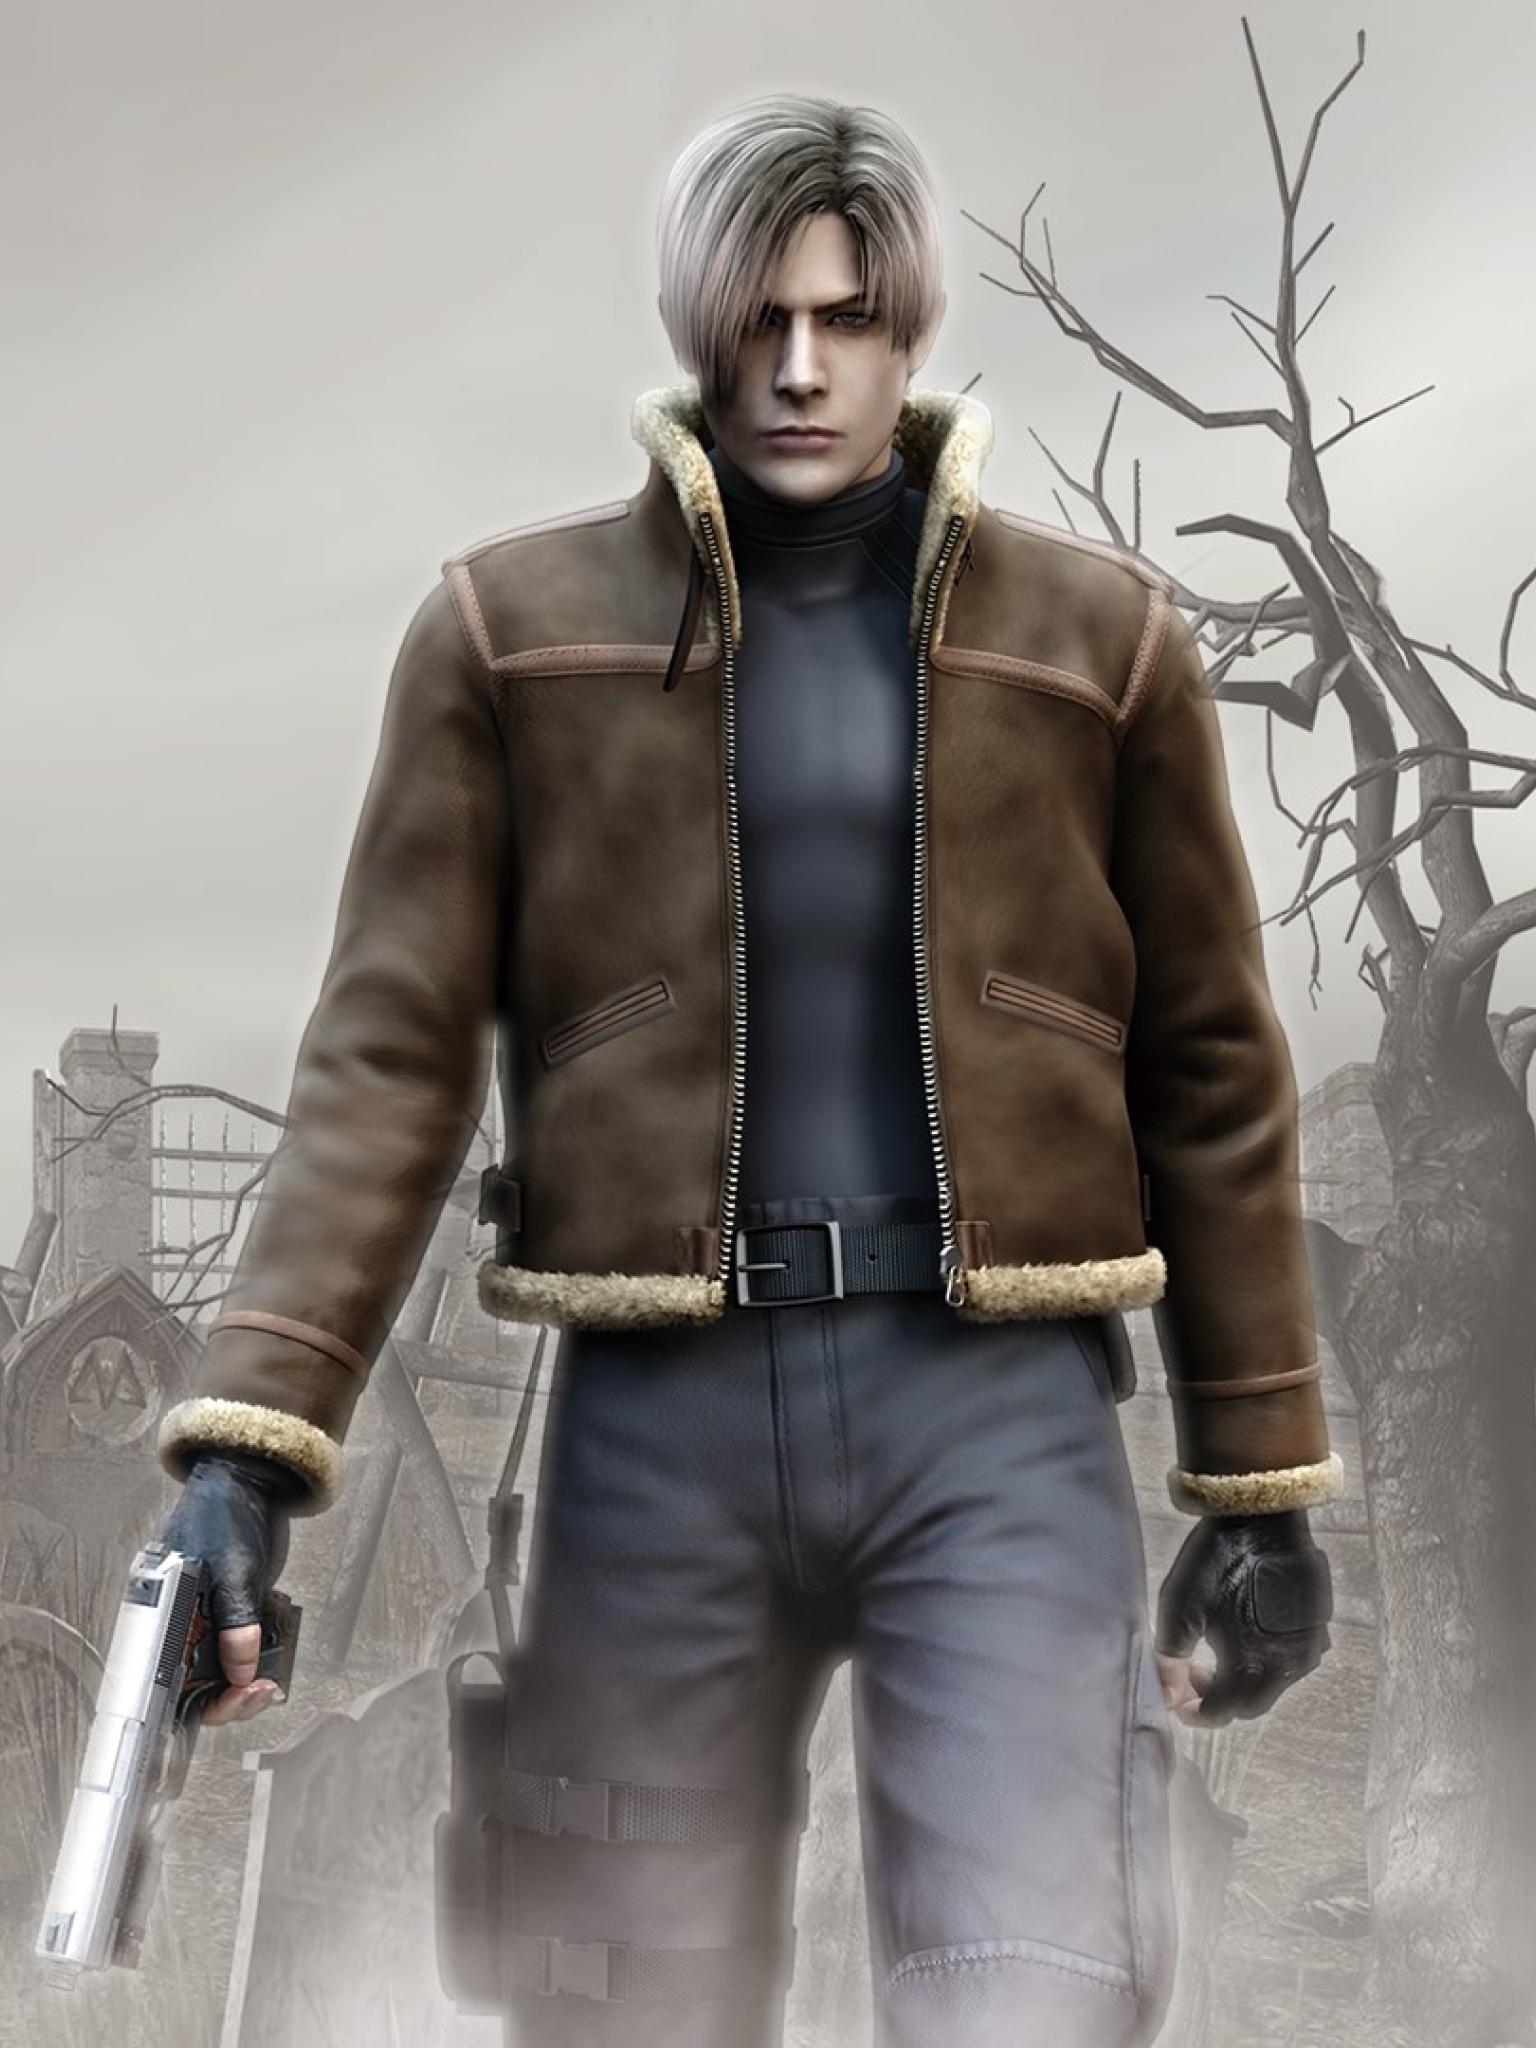 1536x2048 Resident Evil 4 Leon S Kennedy 1536x2048 Resolution